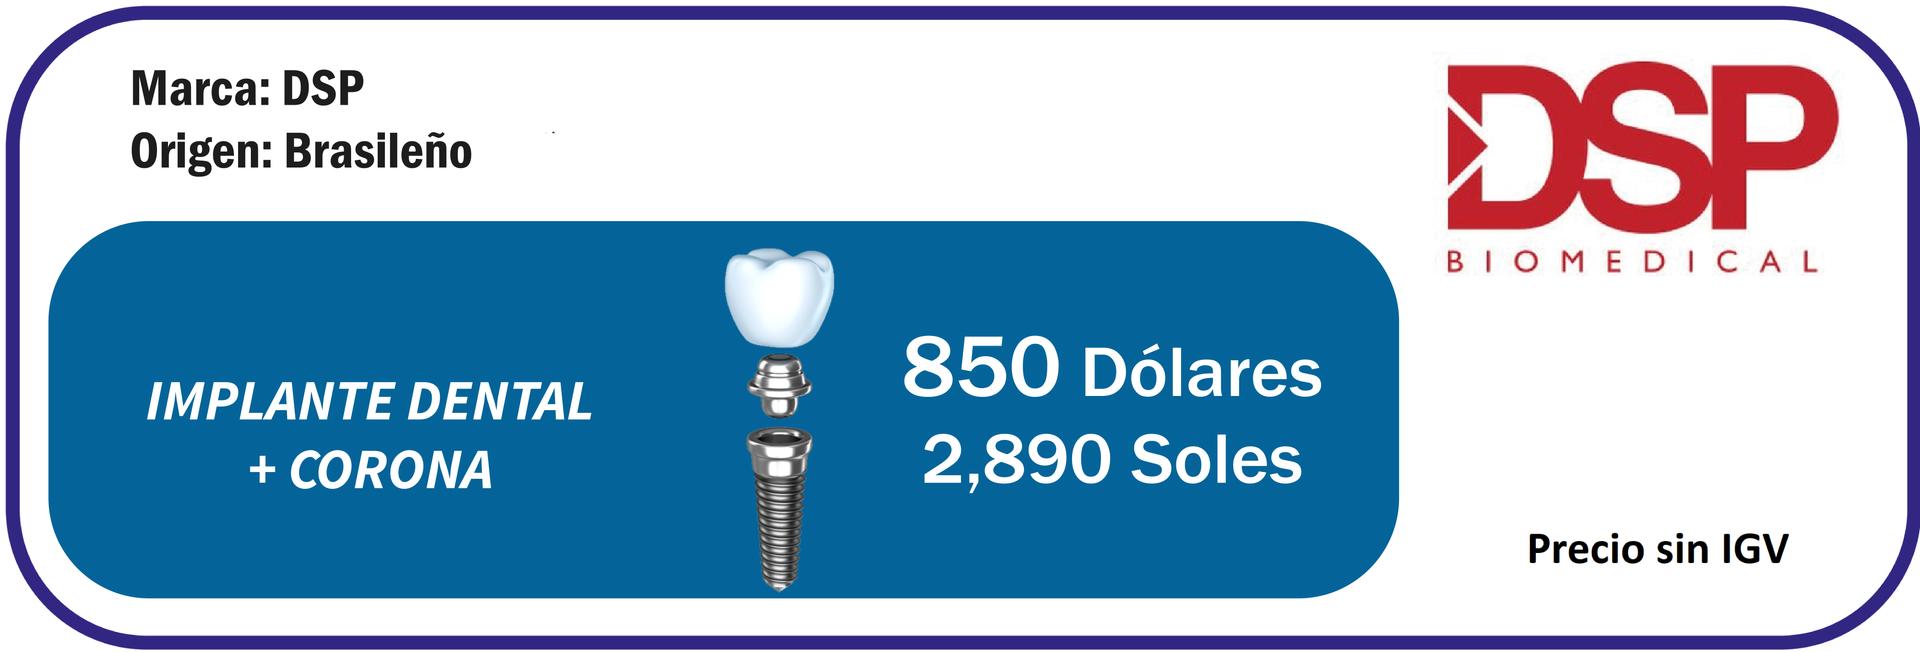 dsp-implantes-dentales